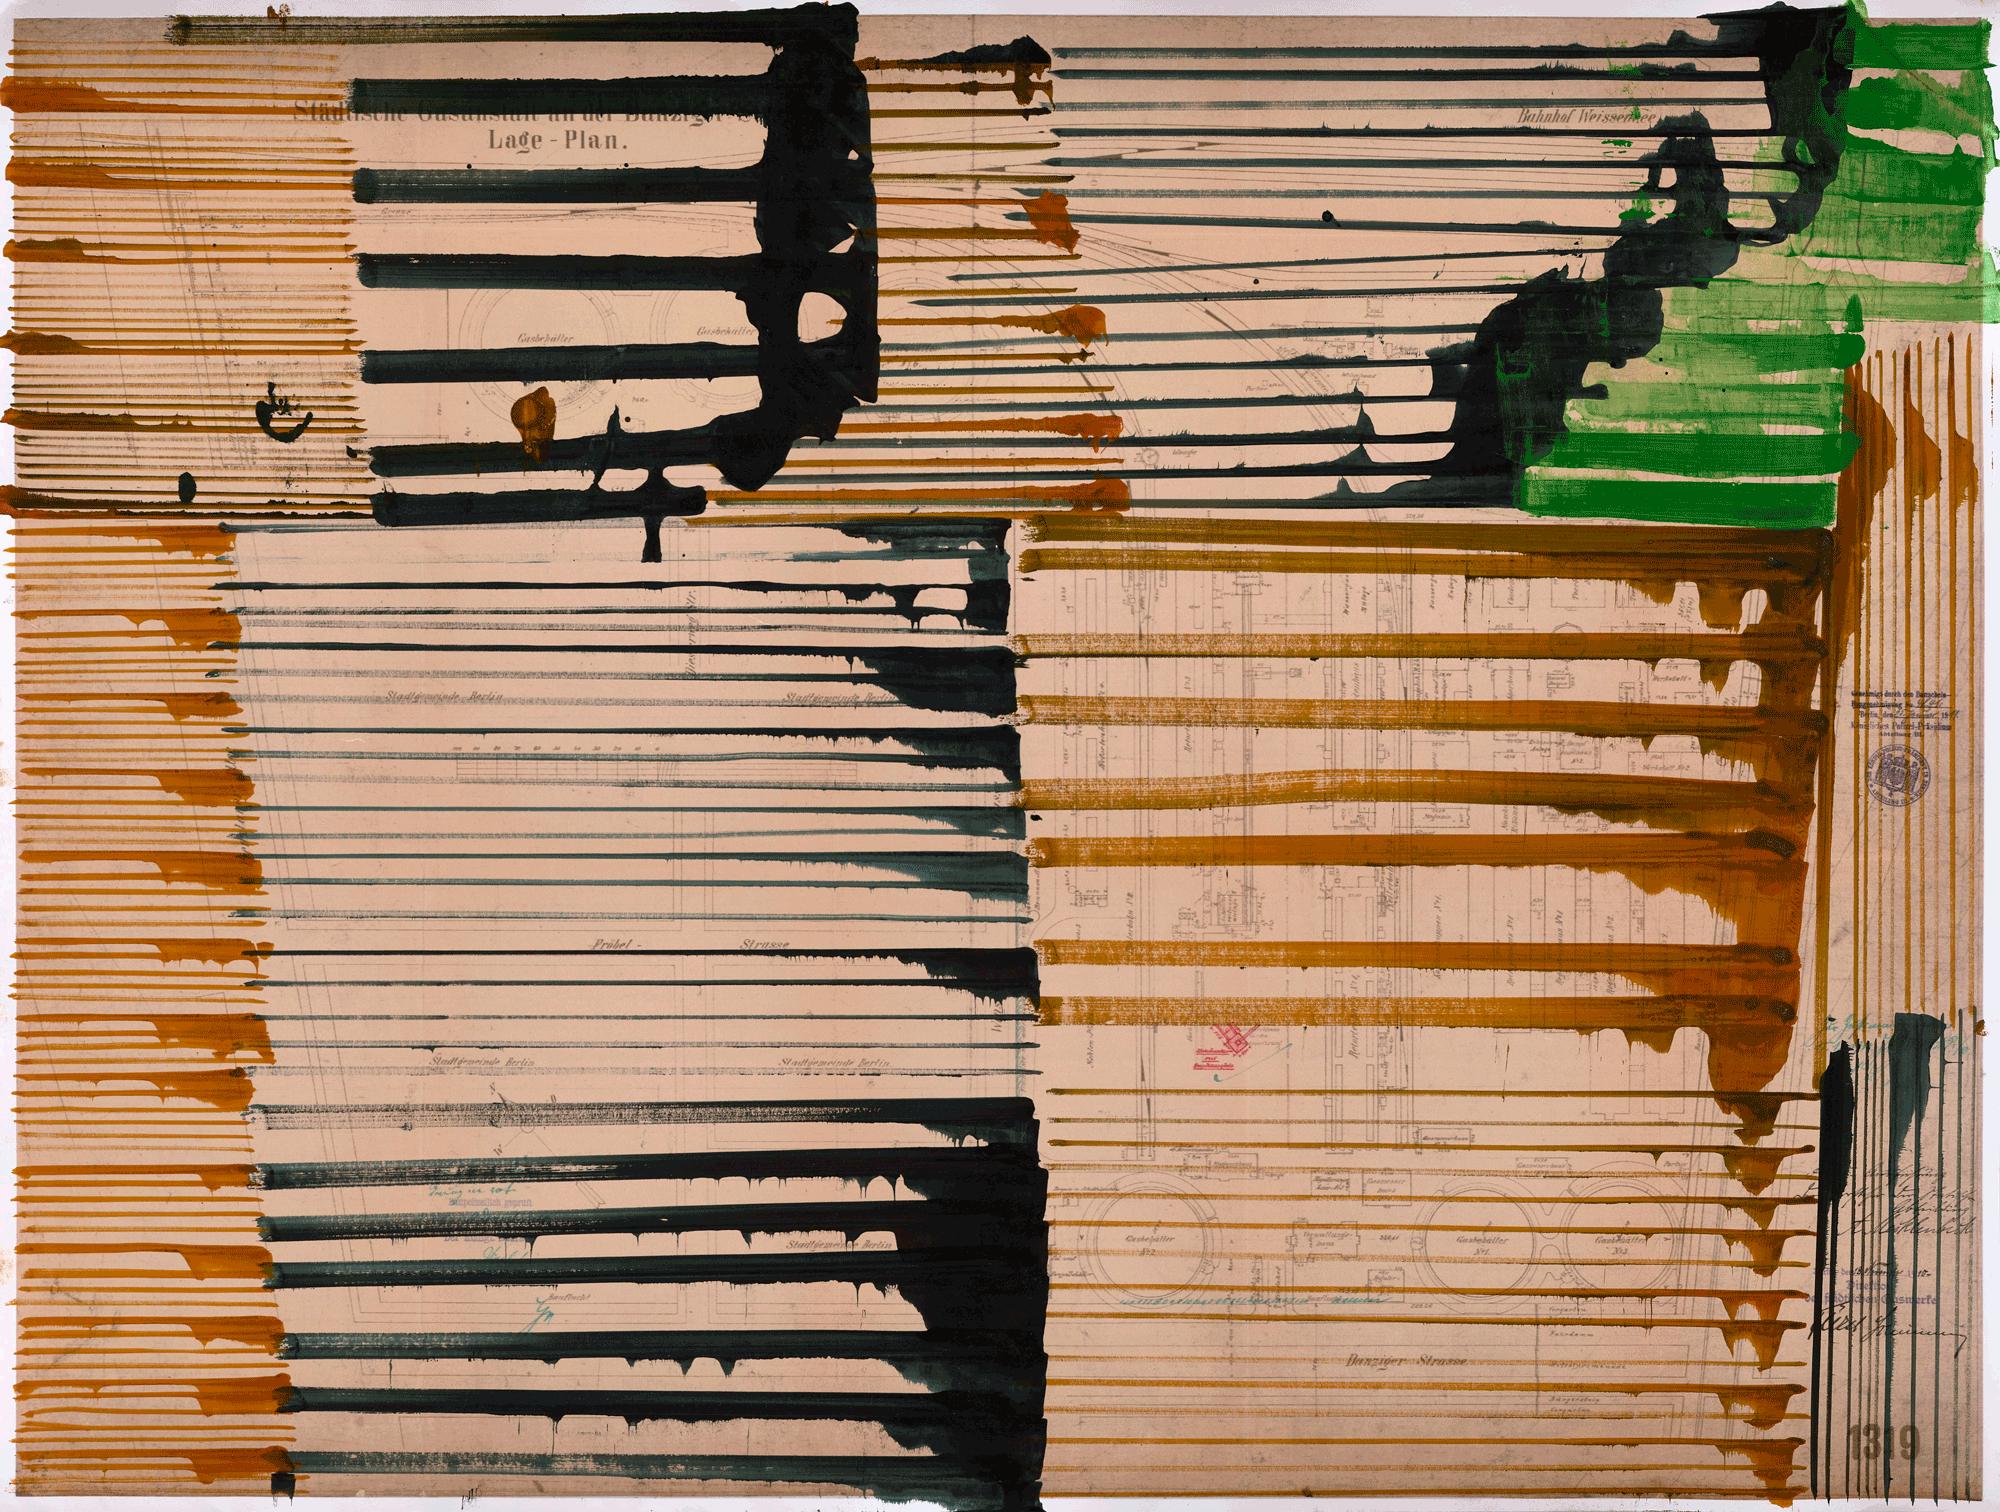 Yvonne Andreini, Time Layers II, 2020, 45 x 60.cm, Tusche und Acryl auf Papier